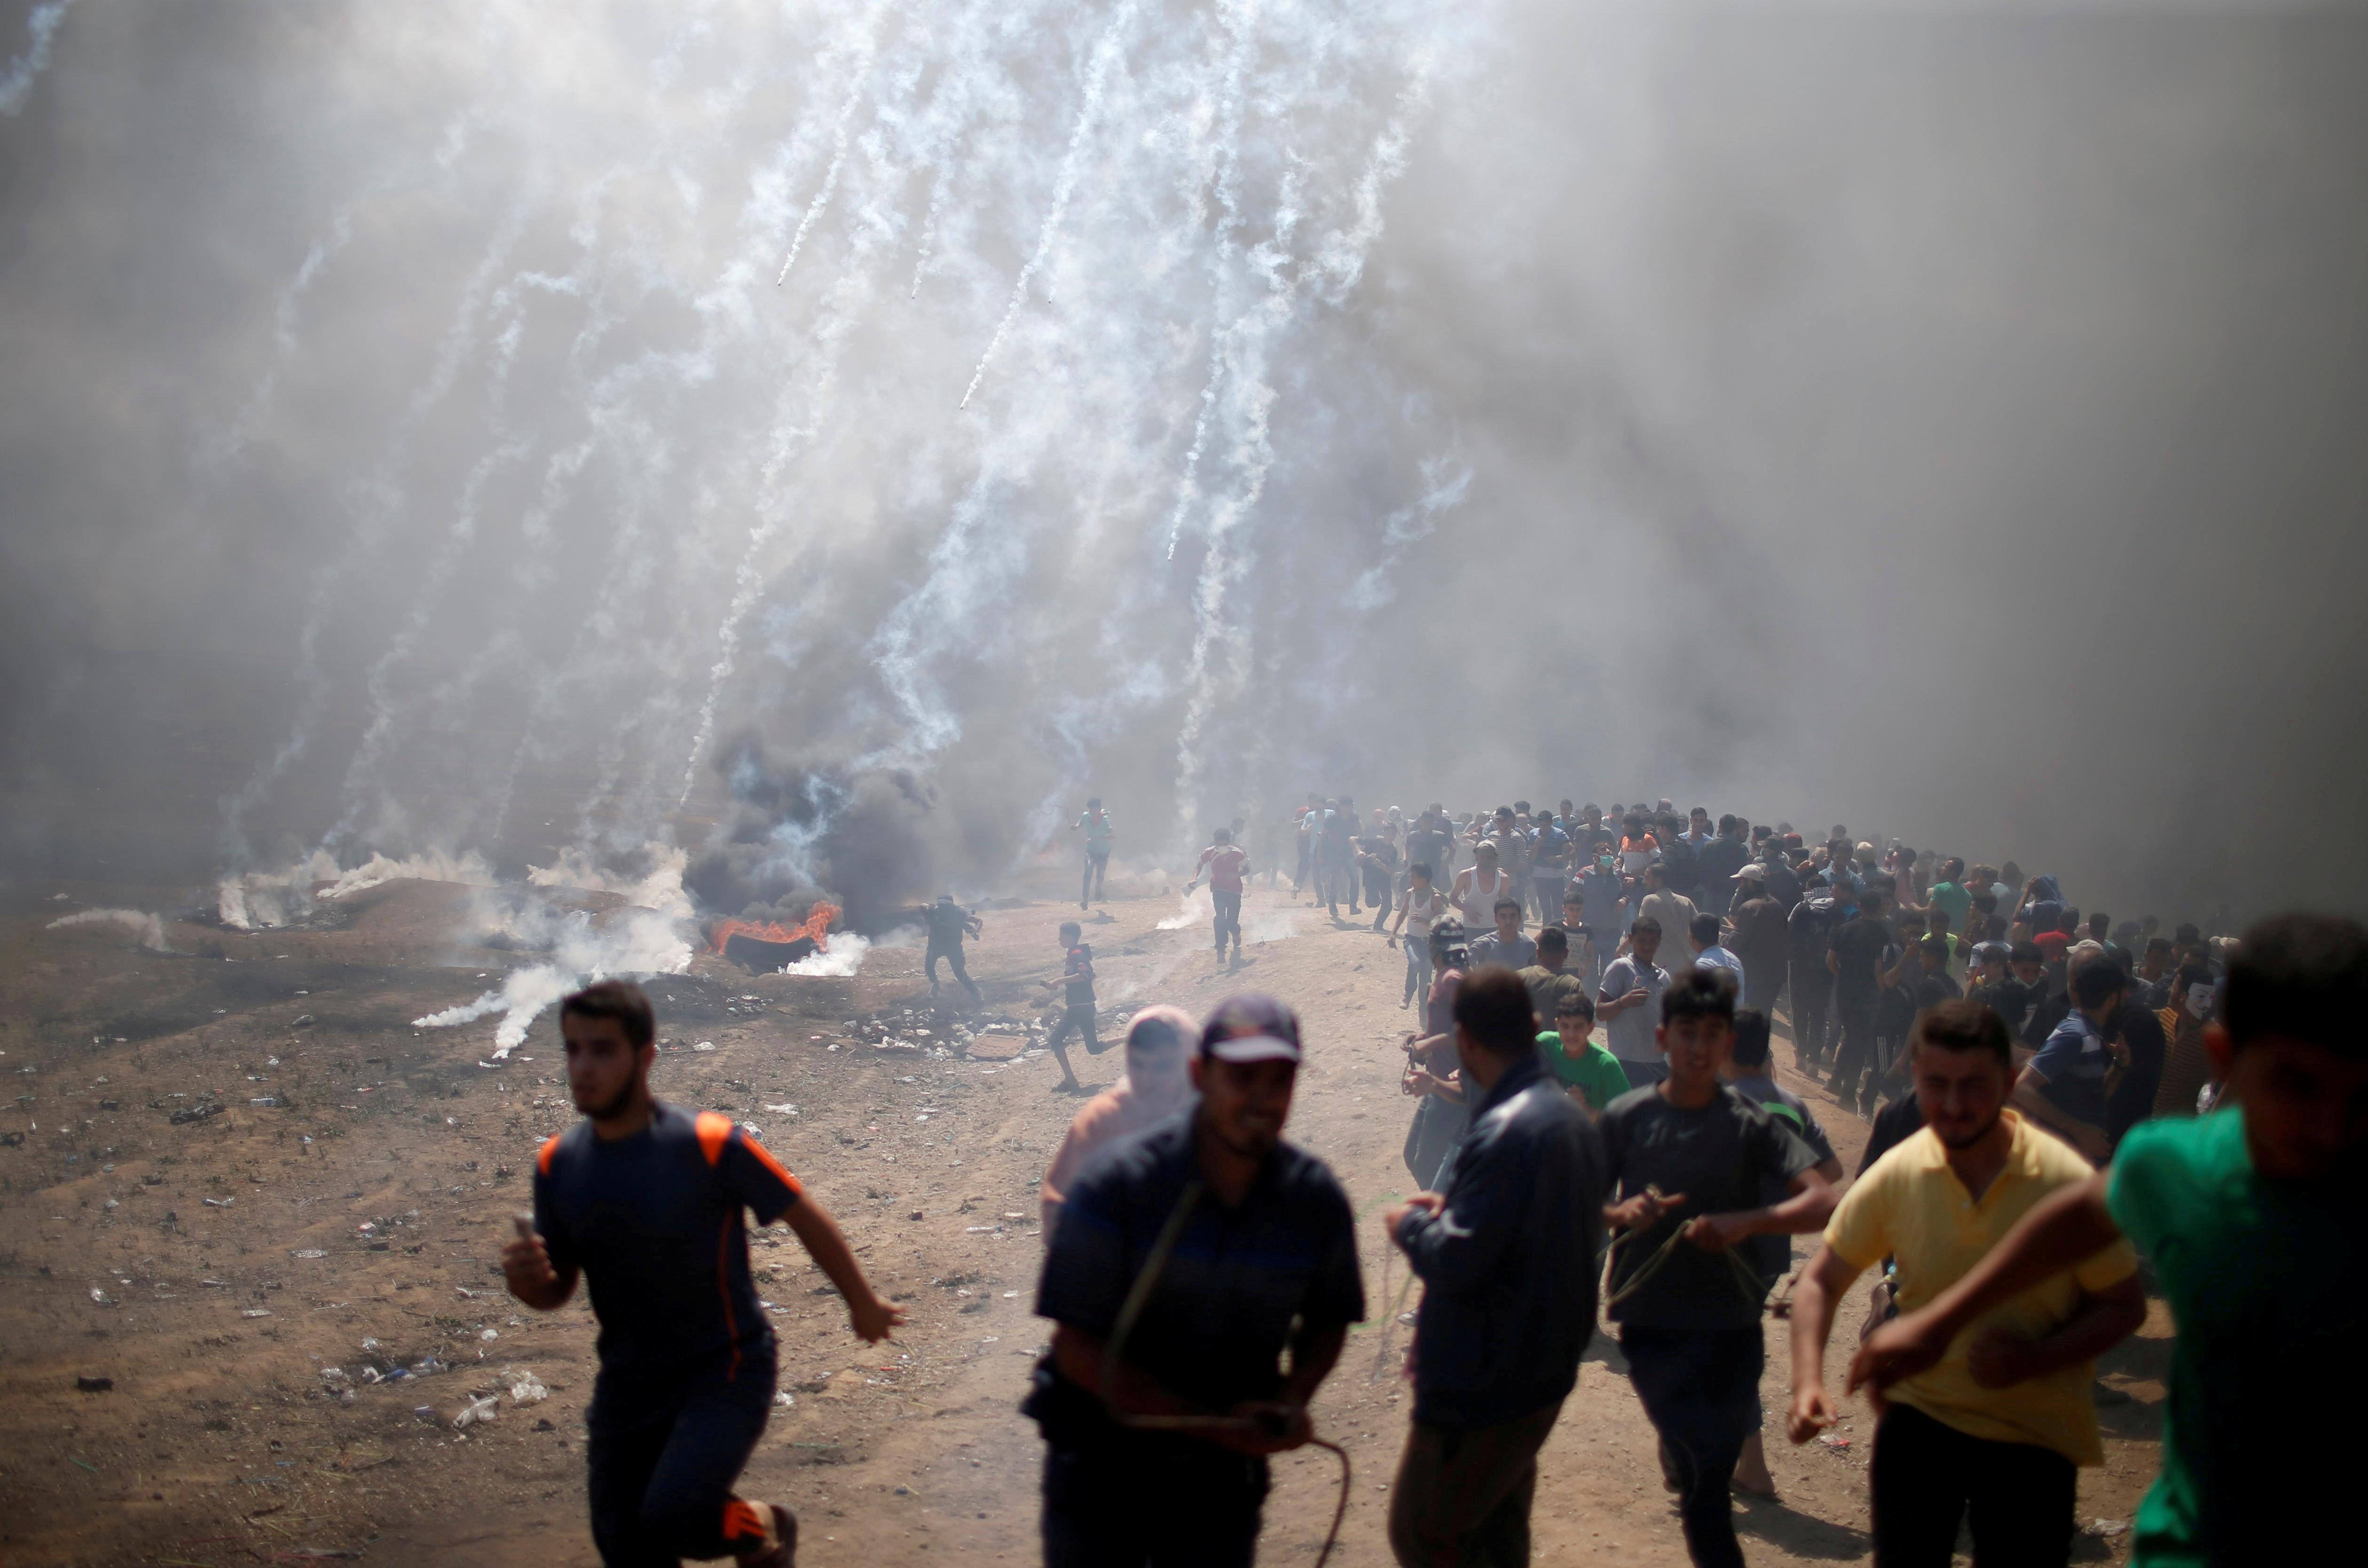 Factbox: Many sticks, few carrots - Trump's Palestinian policy